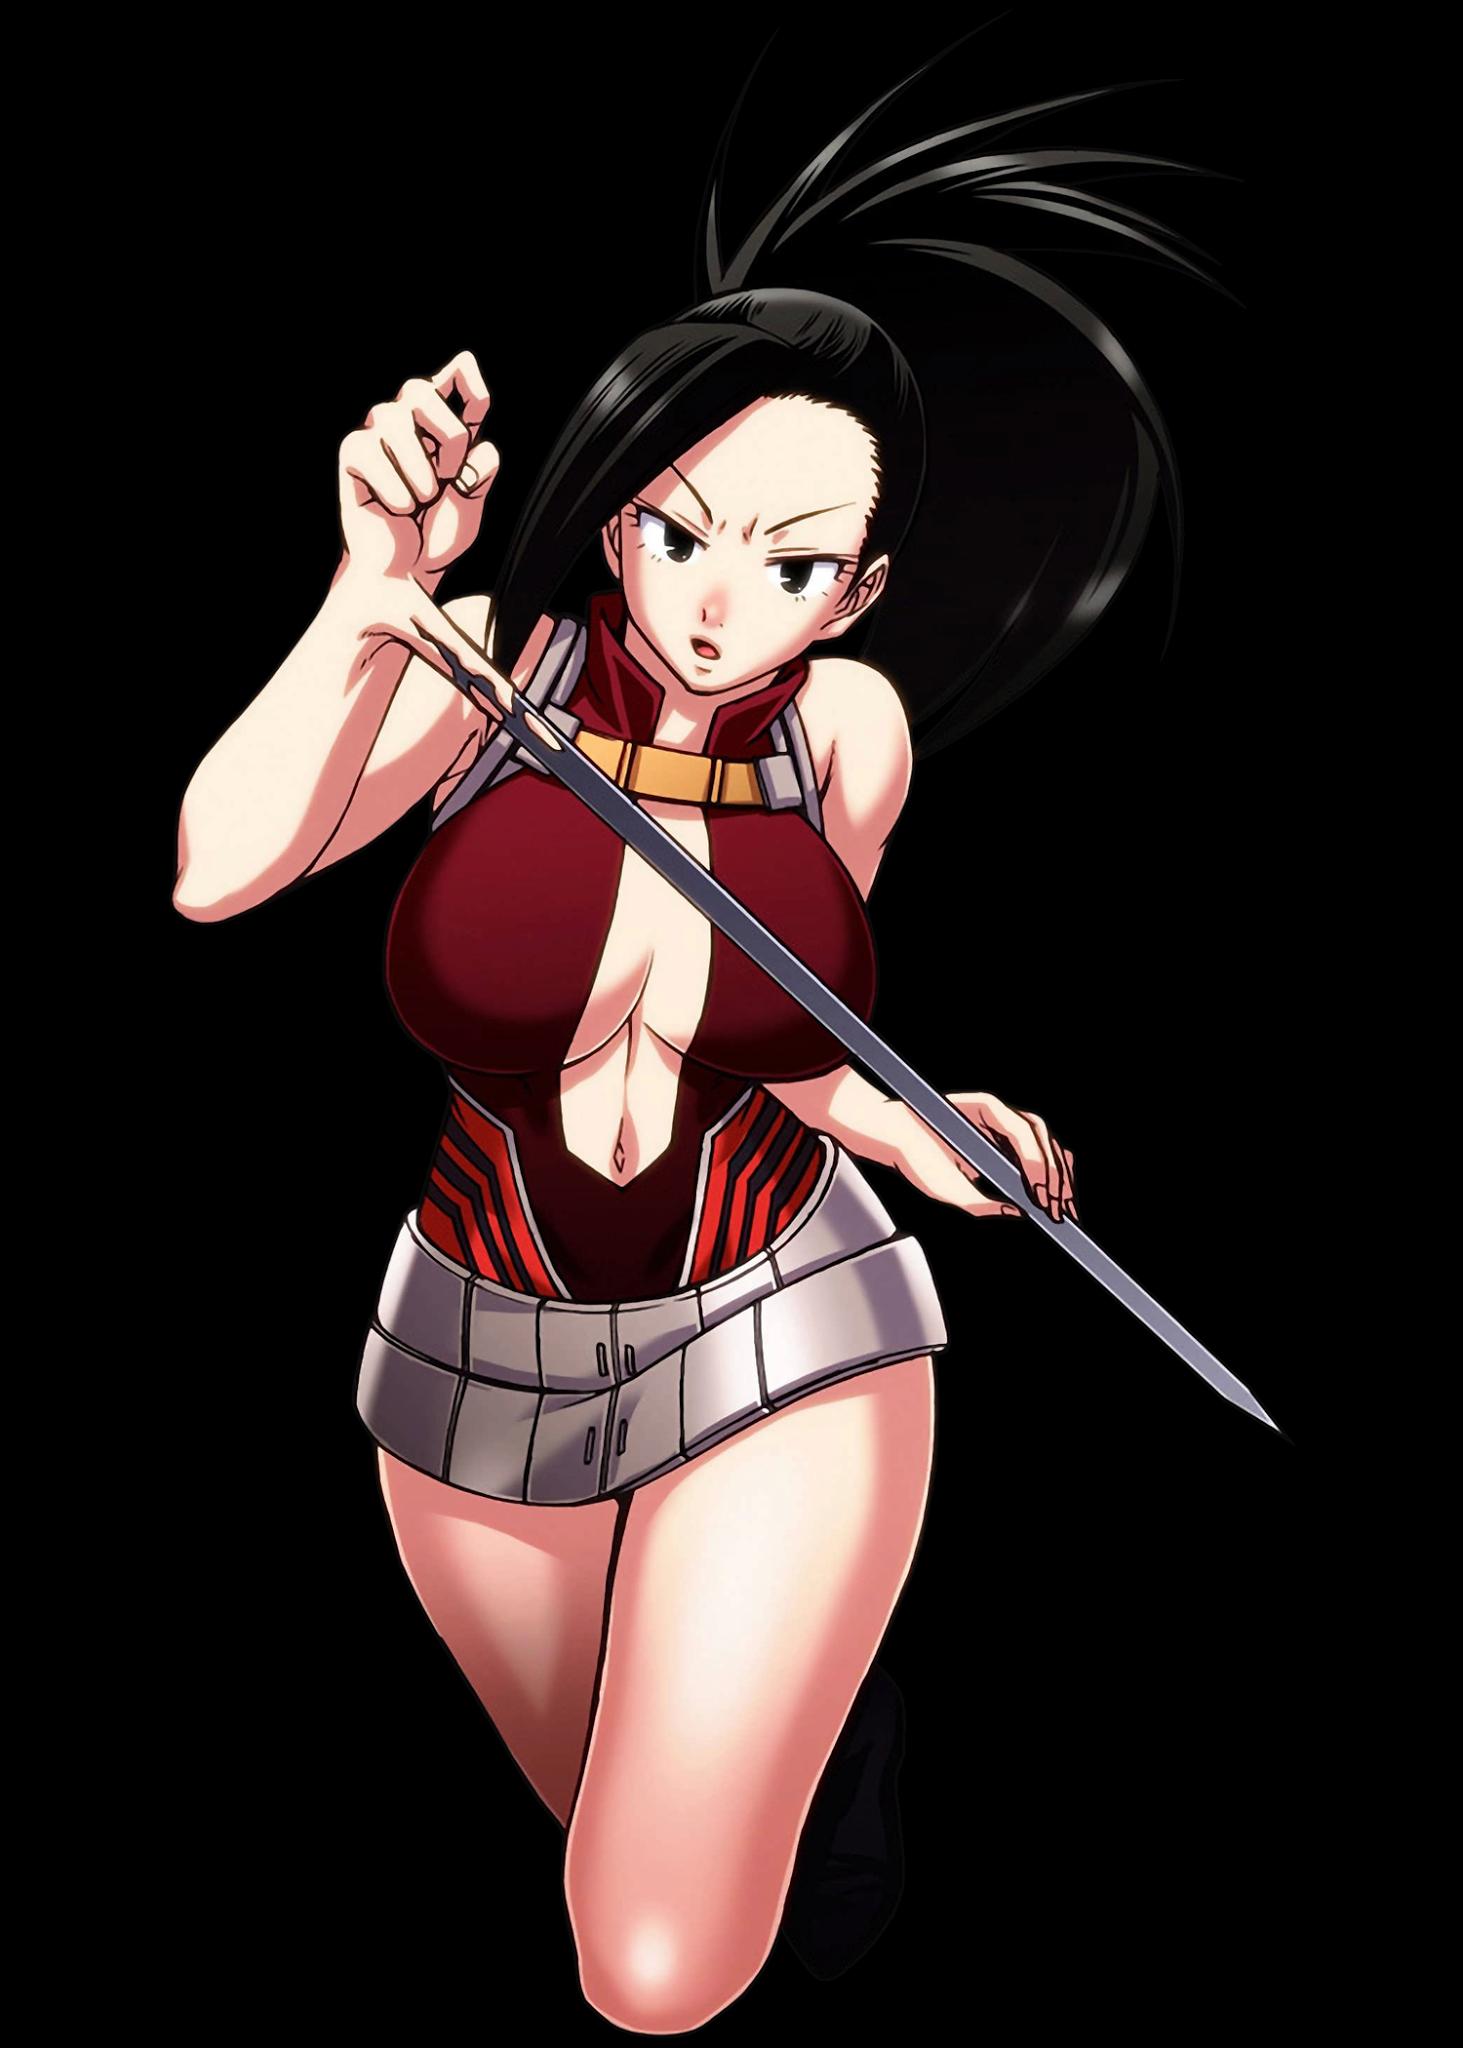 Heroaca - Yaoyorozu Momo